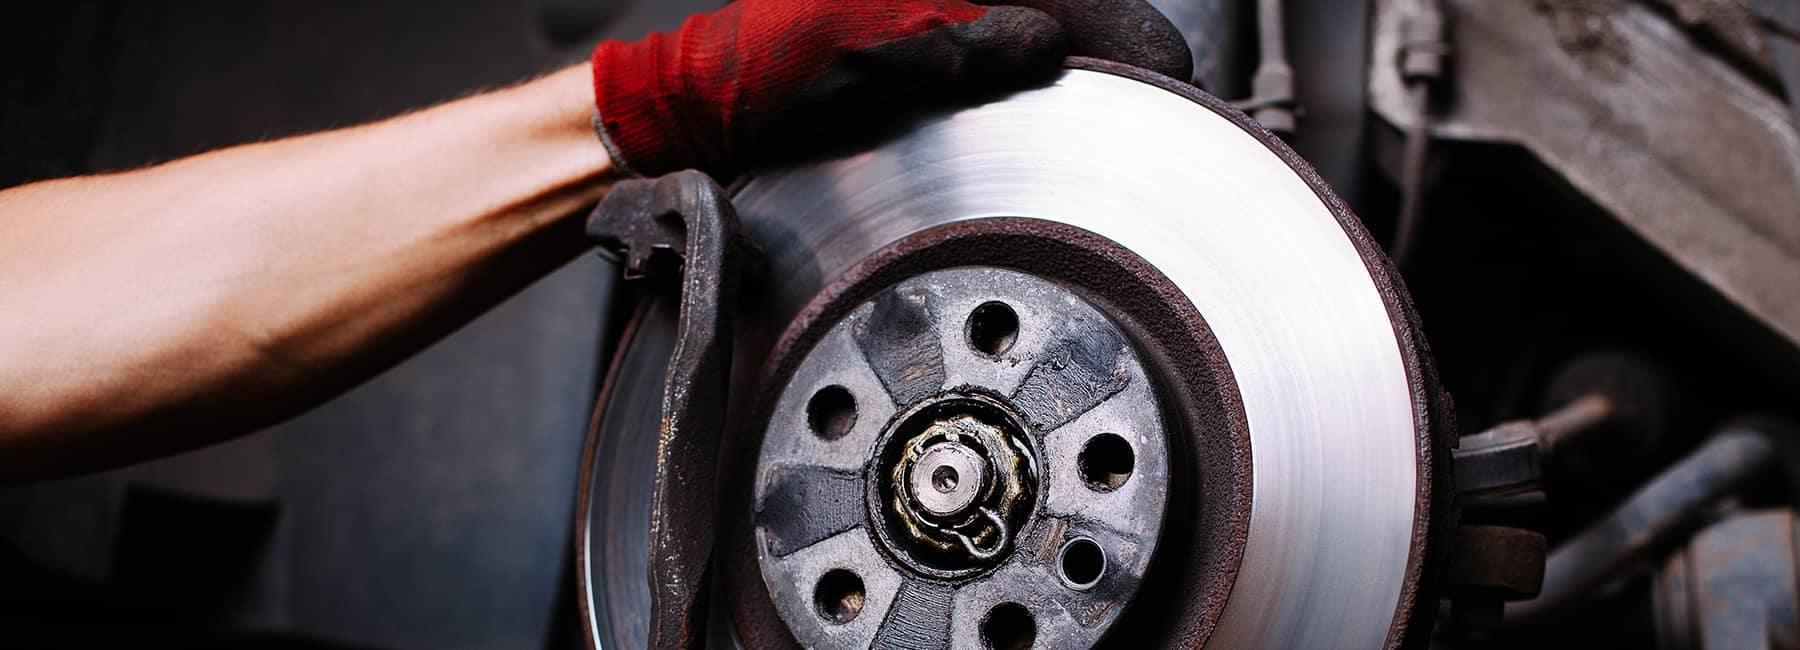 GM Parts | Concord, NH